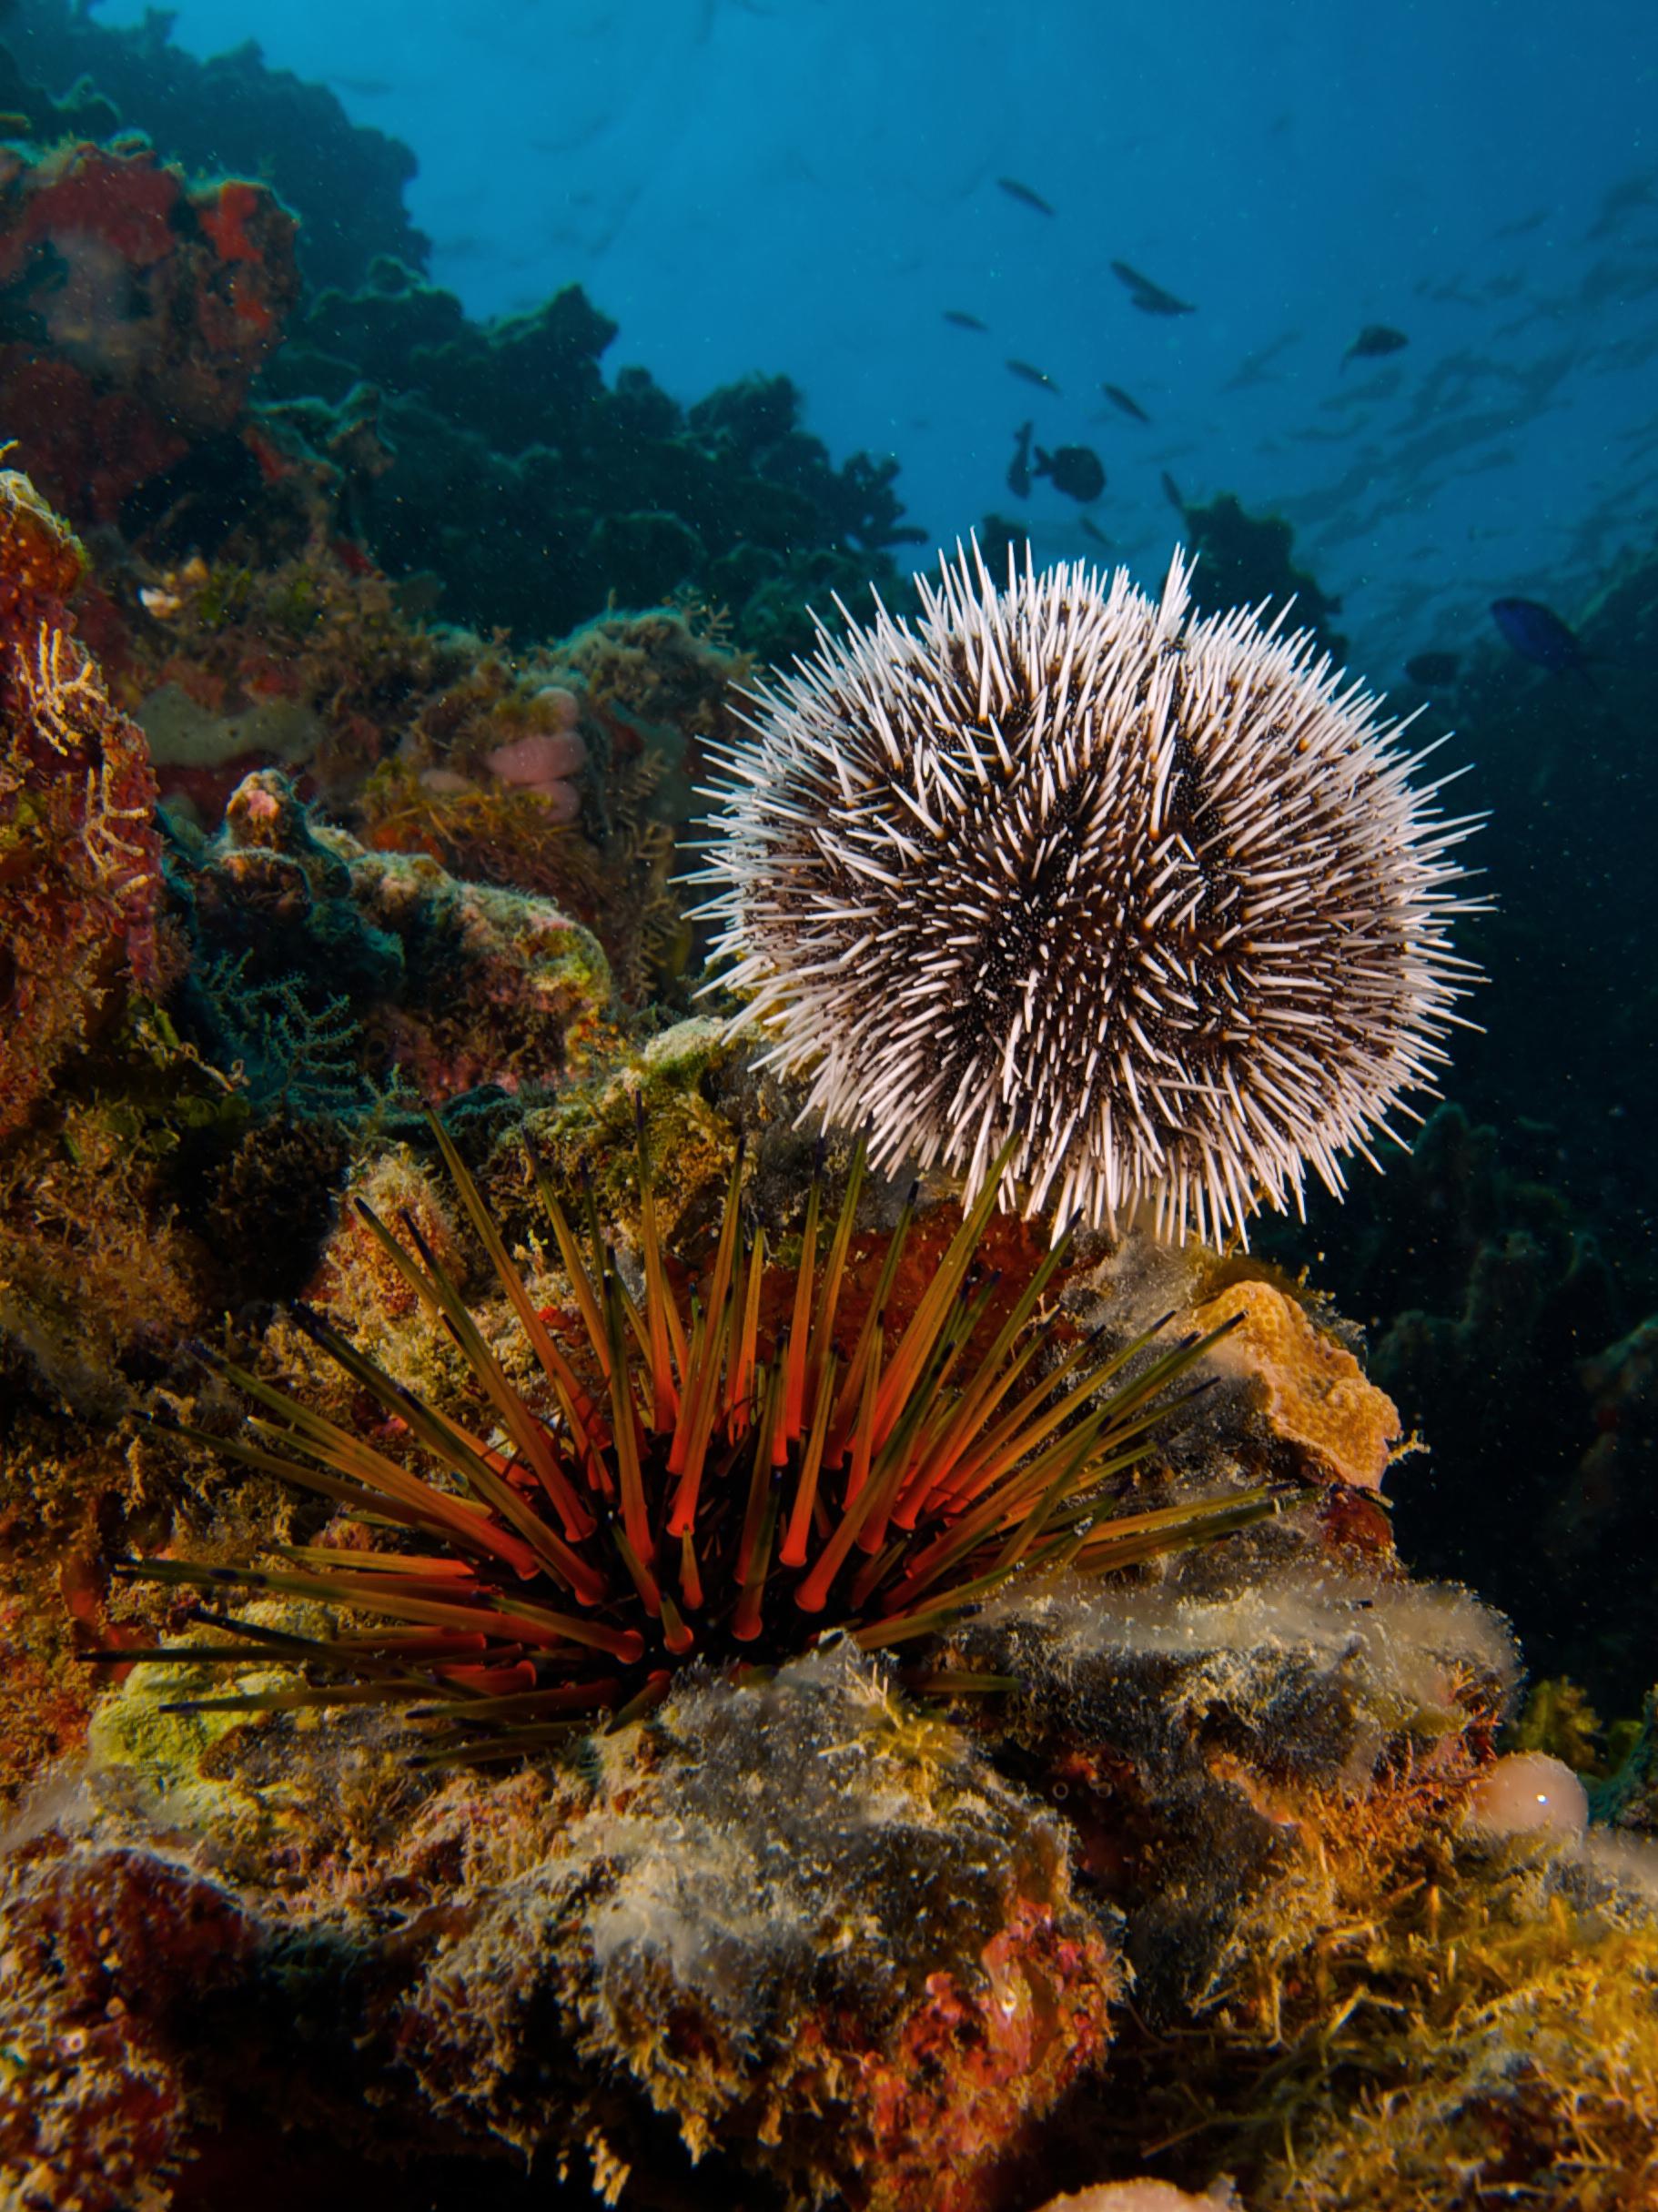 hight resolution of sea urchin